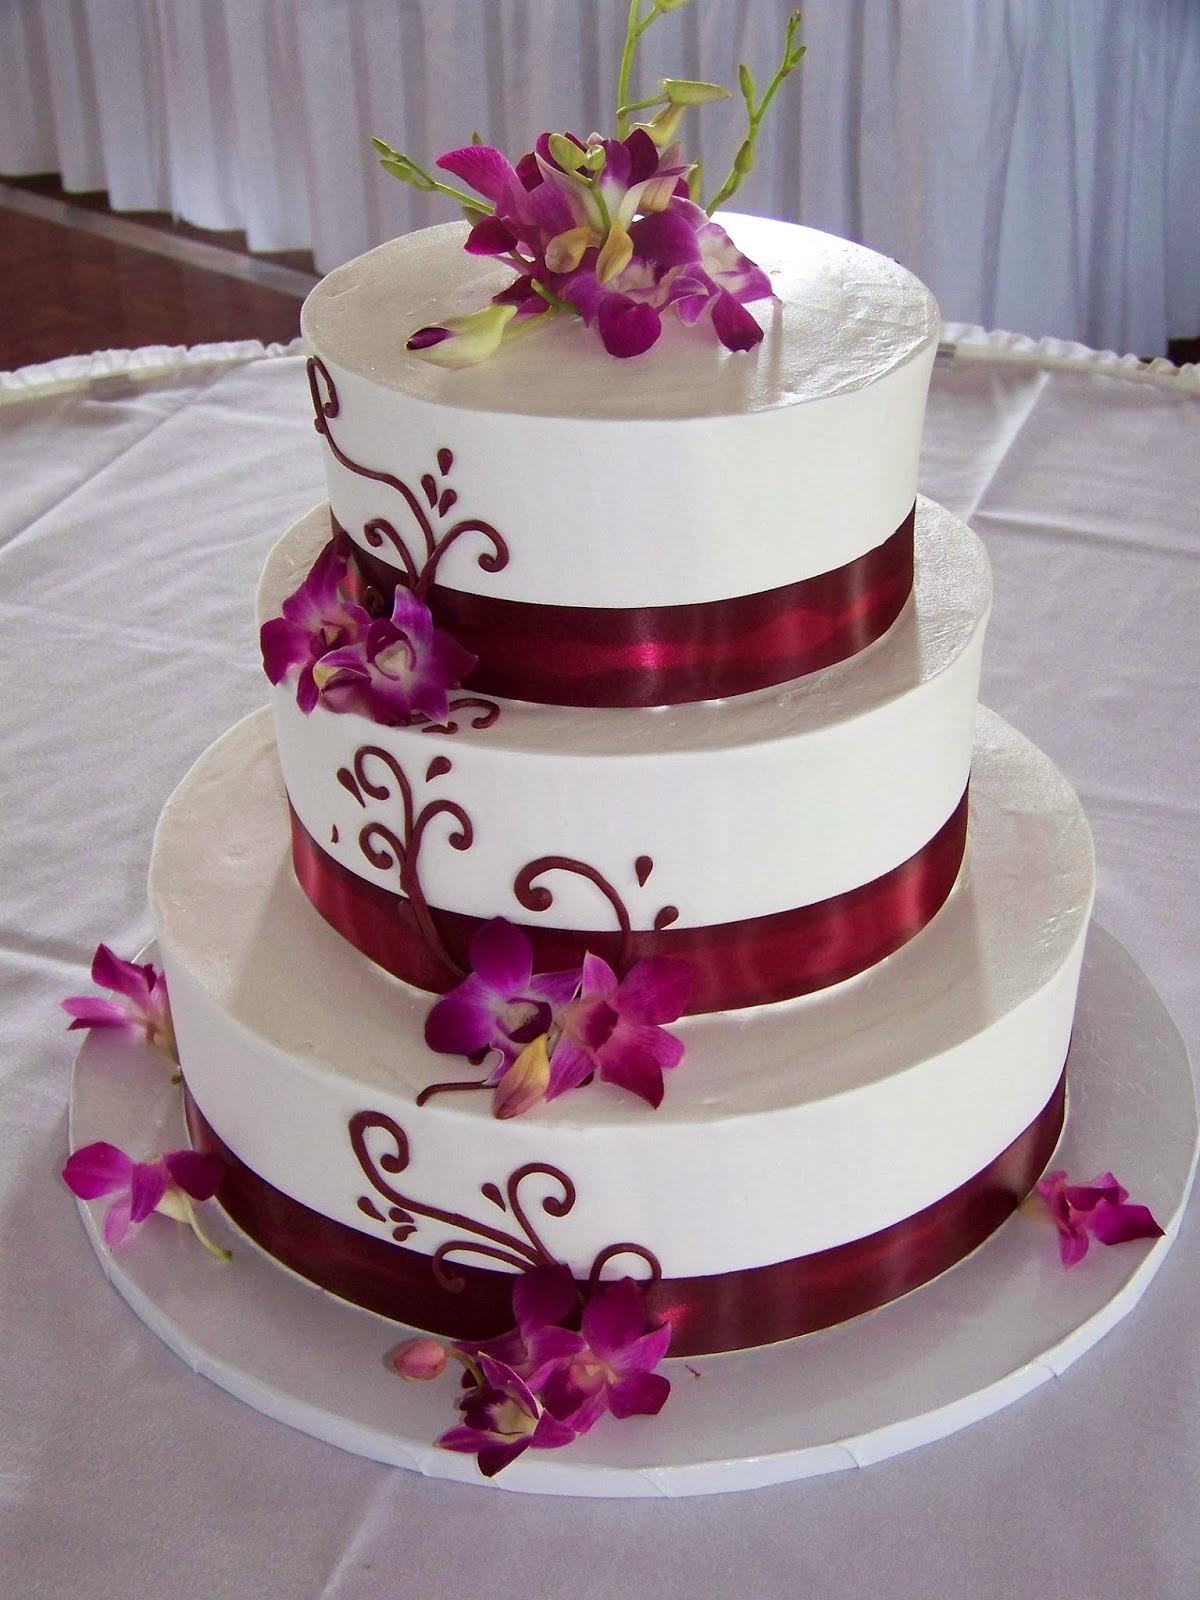 Wedding Cakes Gallery  7 wonders of the world Wedding Cake Hd Gallery